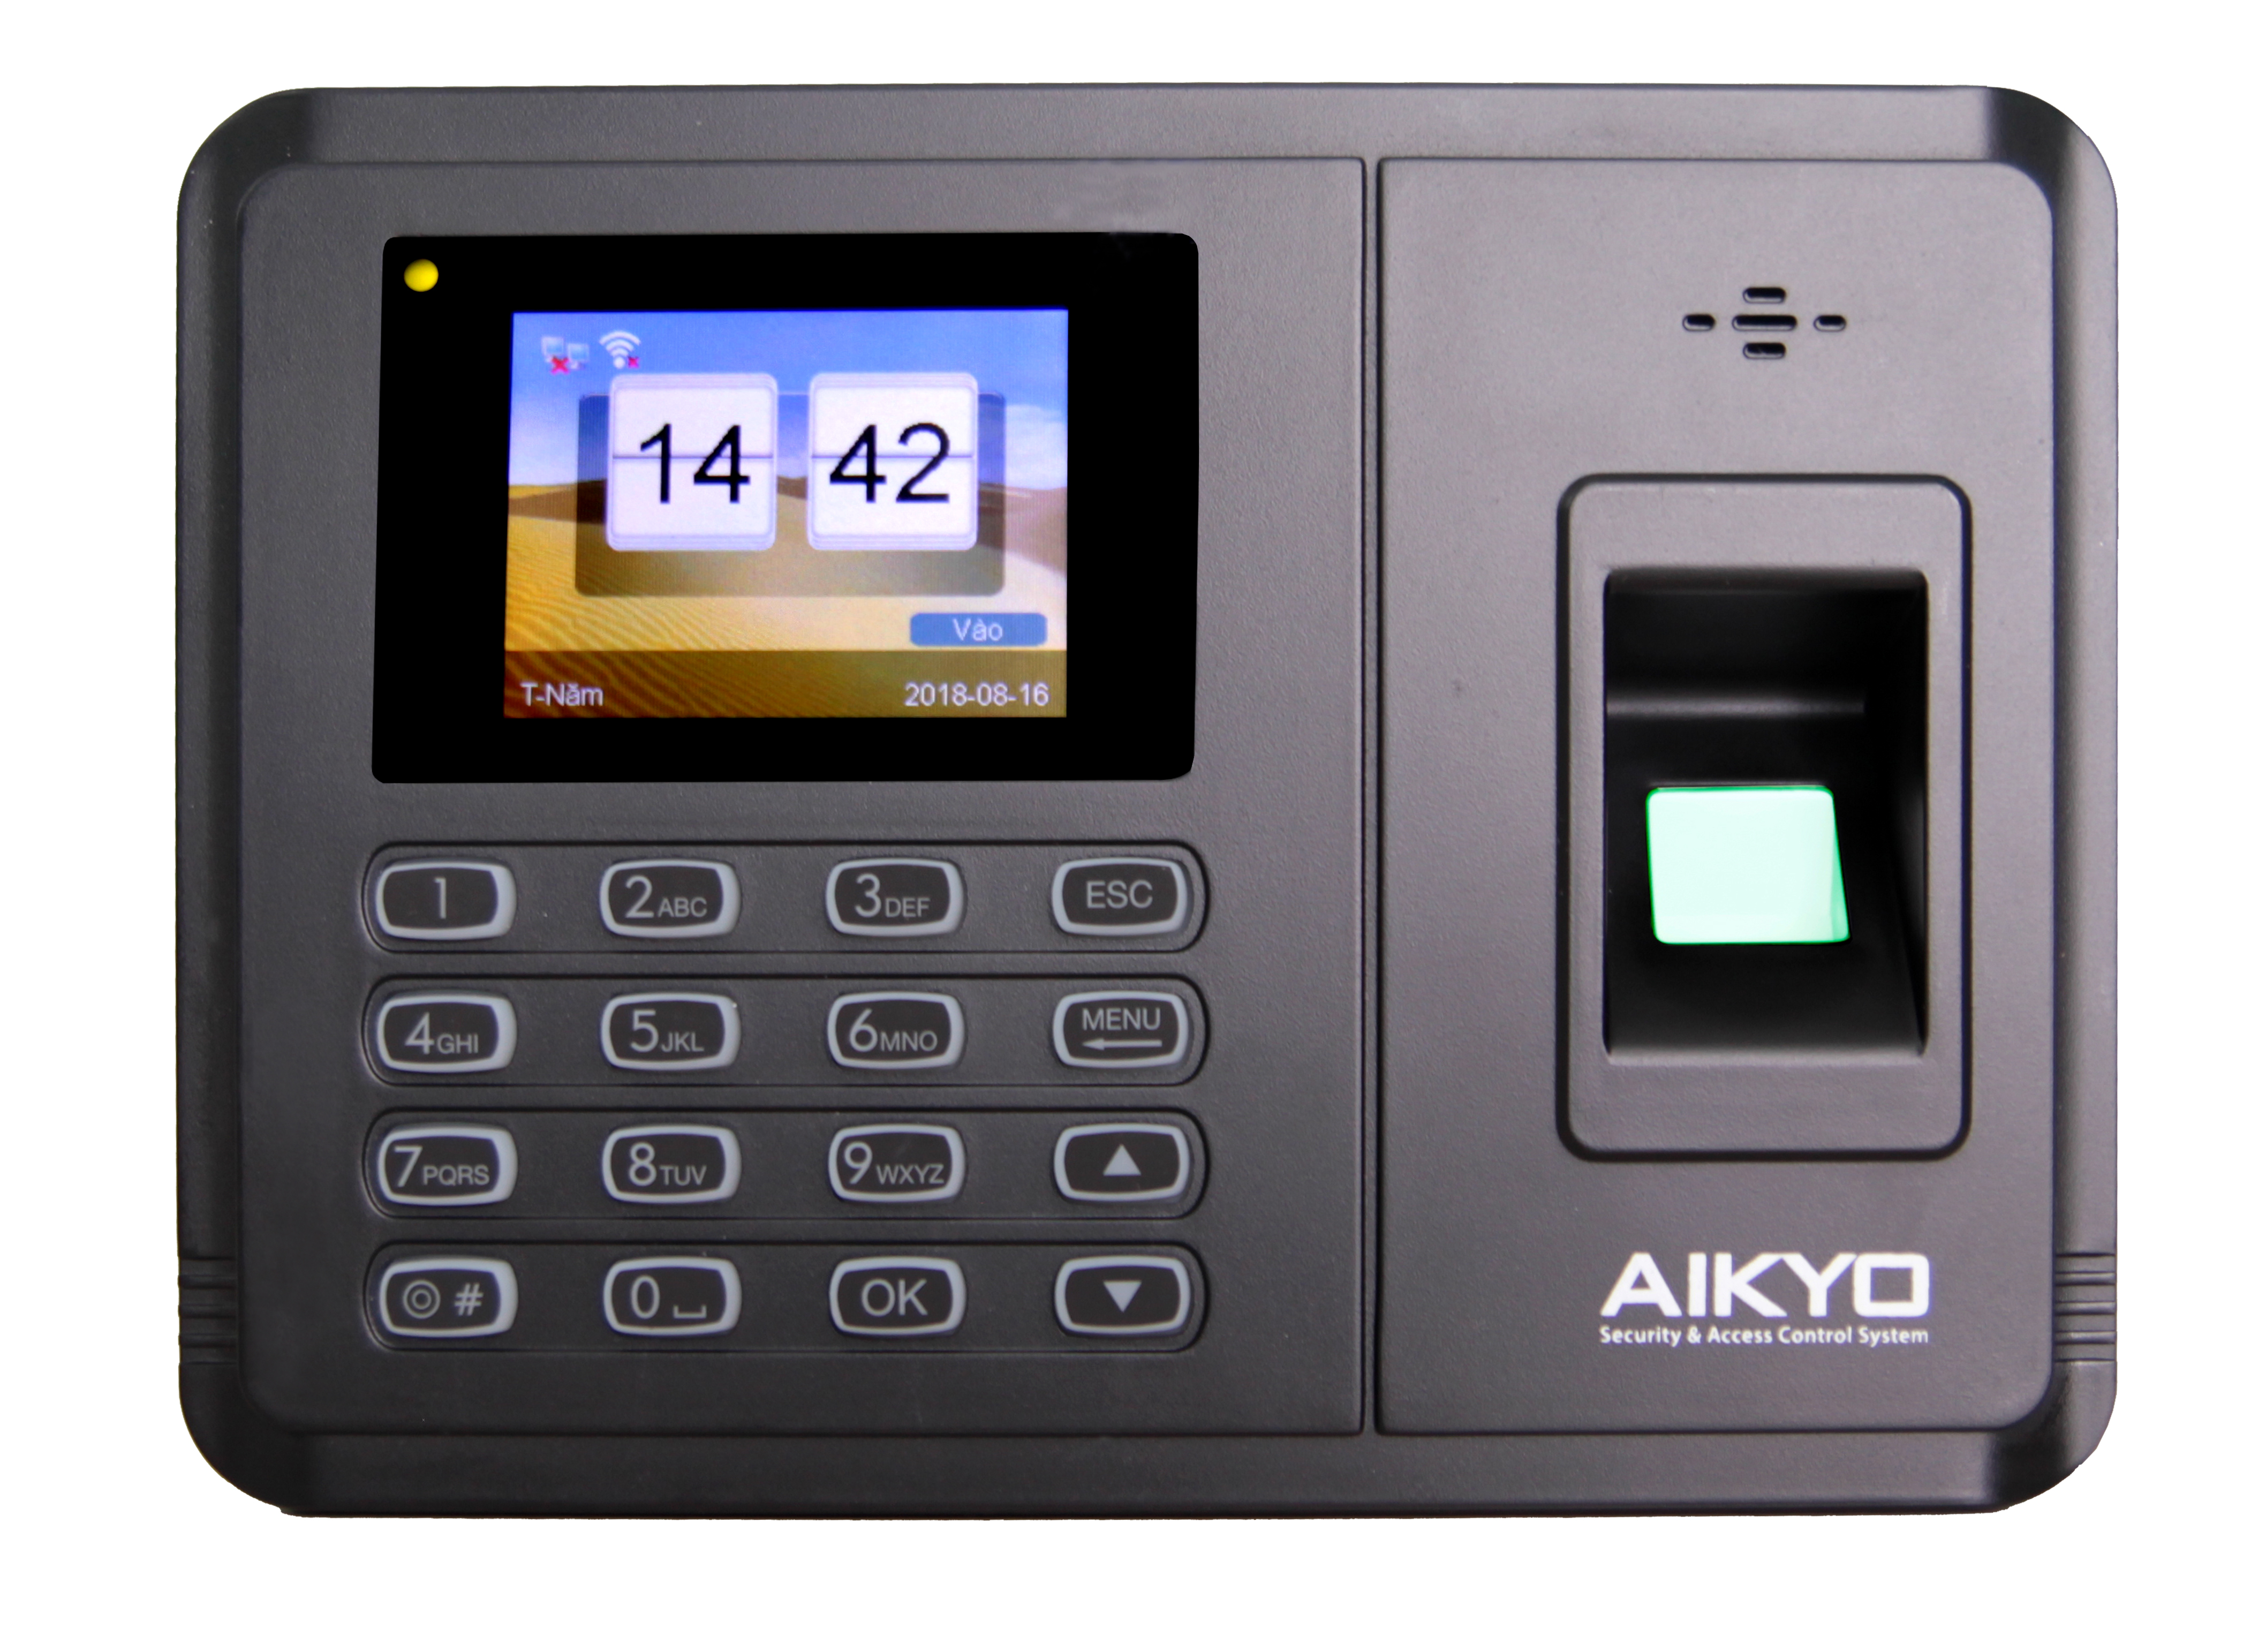 Aikyo 5000TIDC